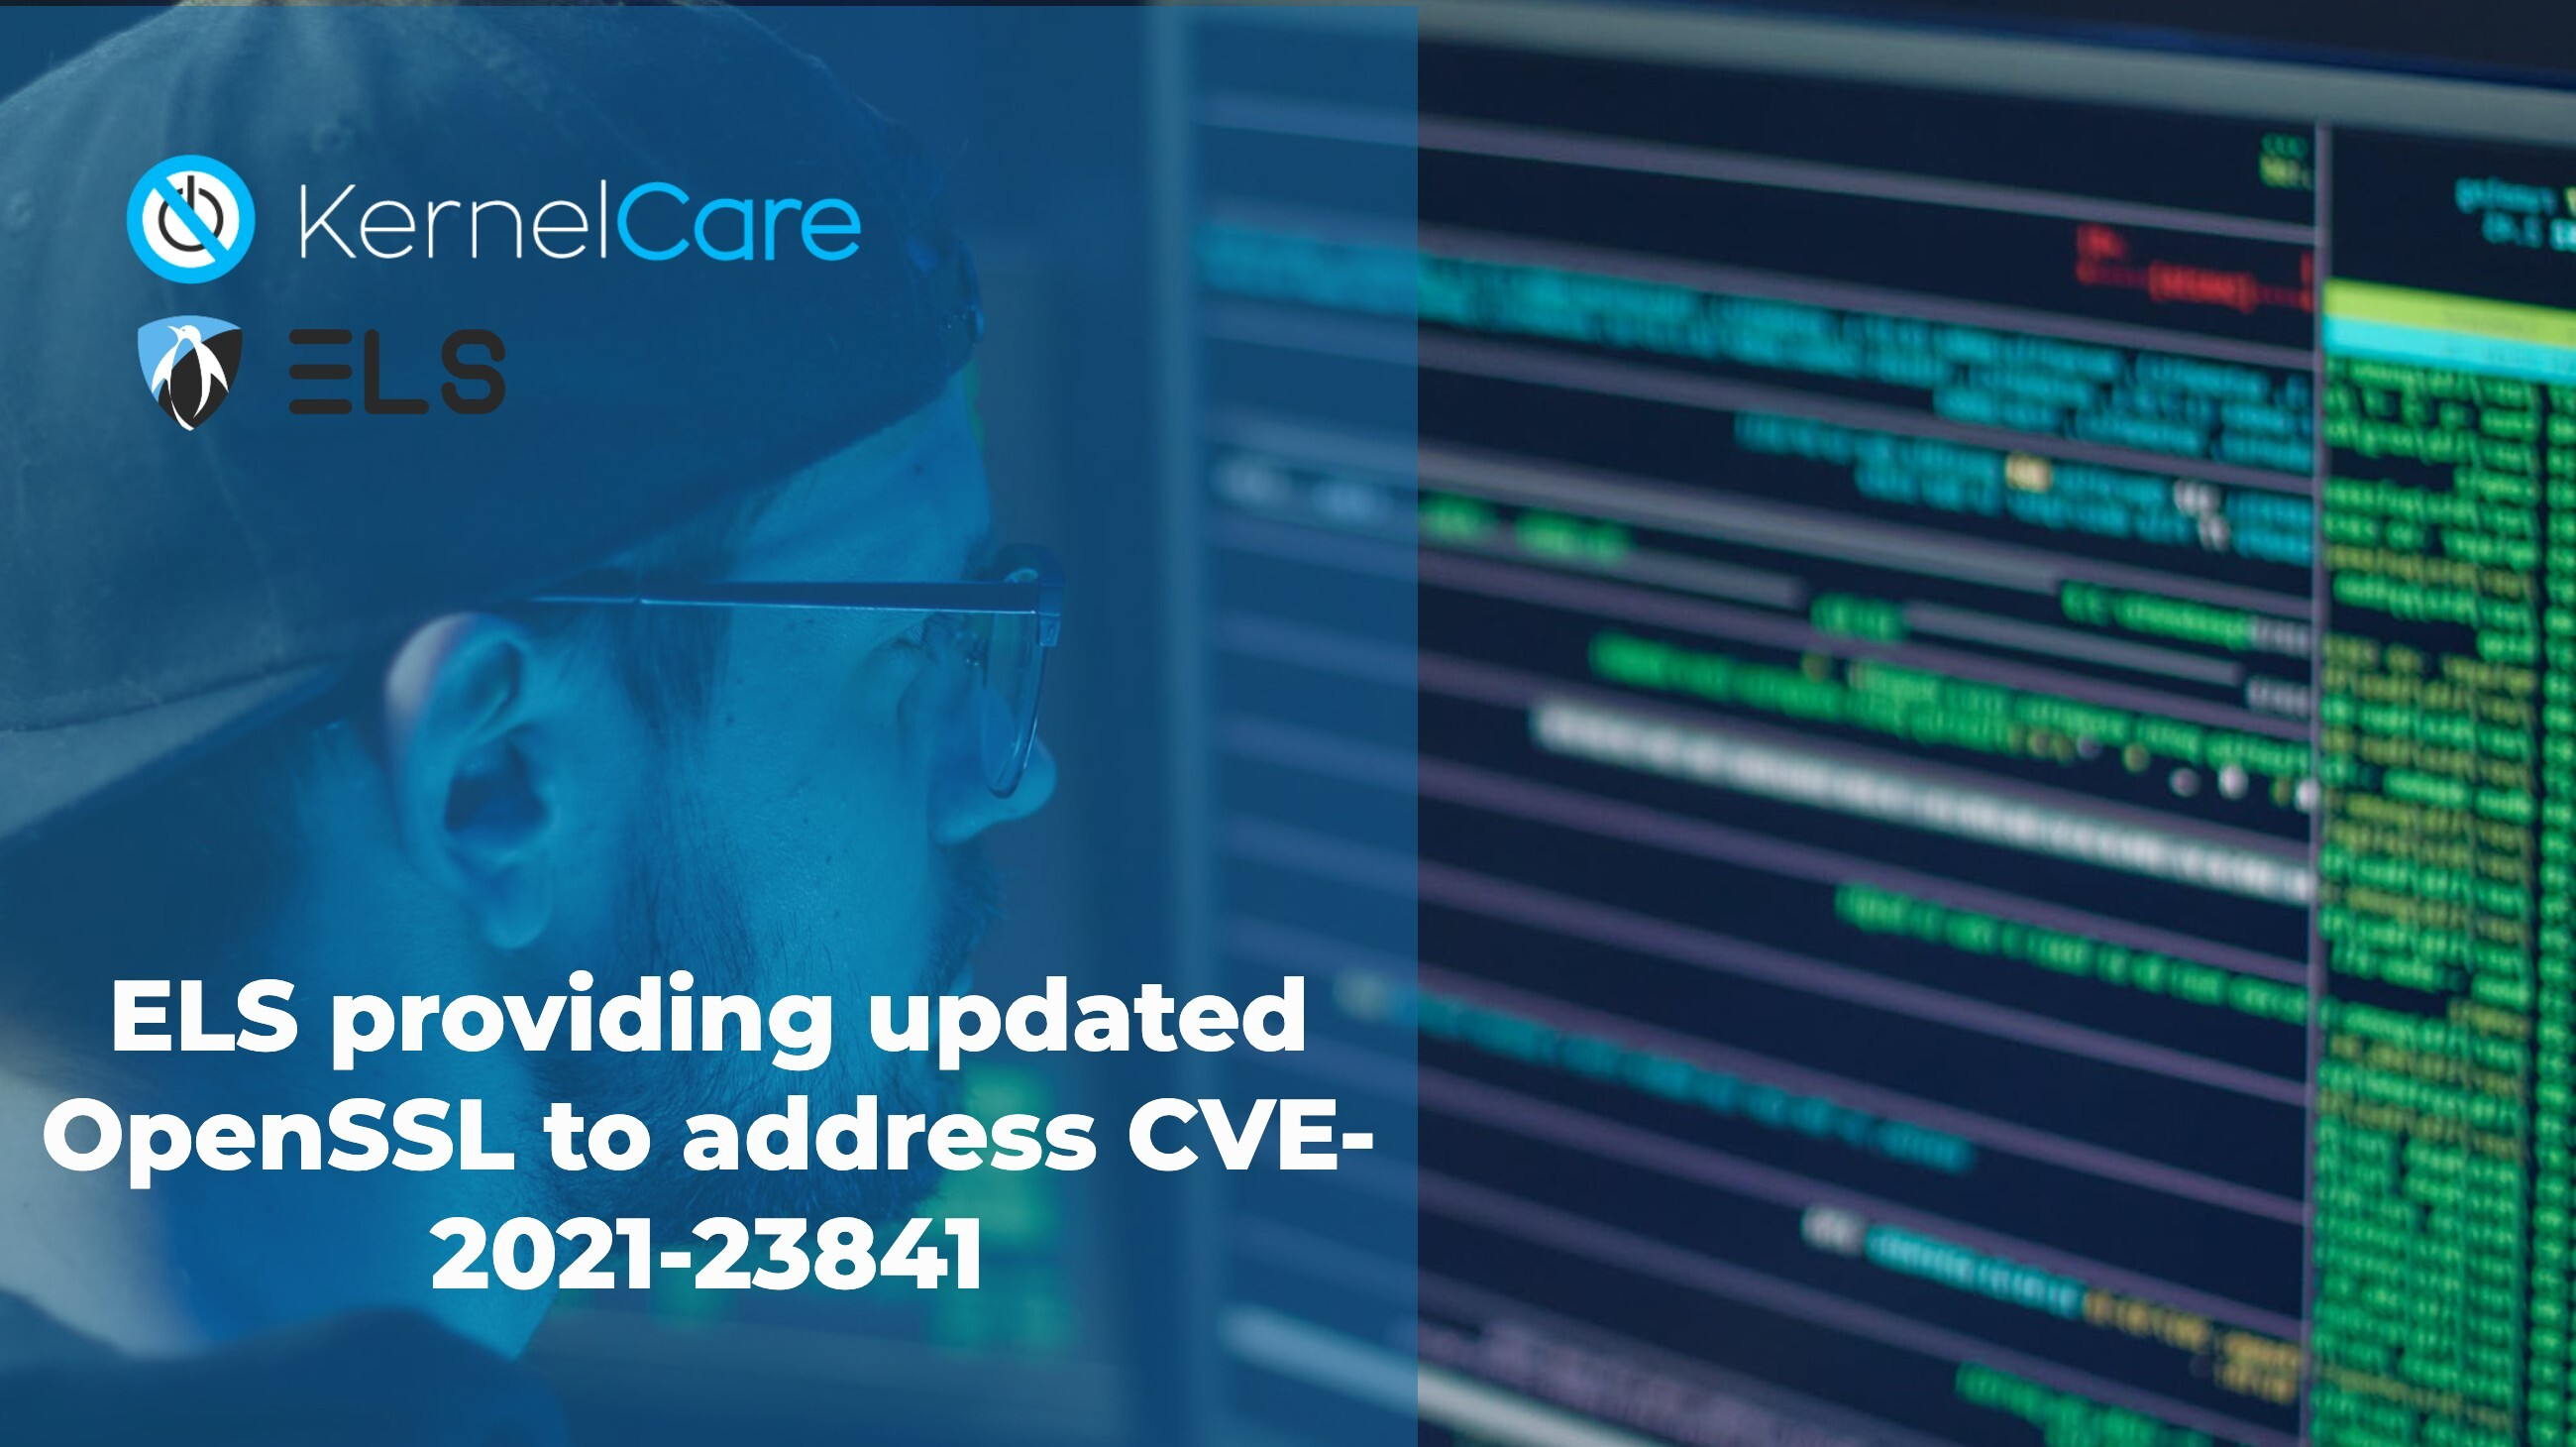 ELS providing updated OpenSSL to address CVE-2021-23841